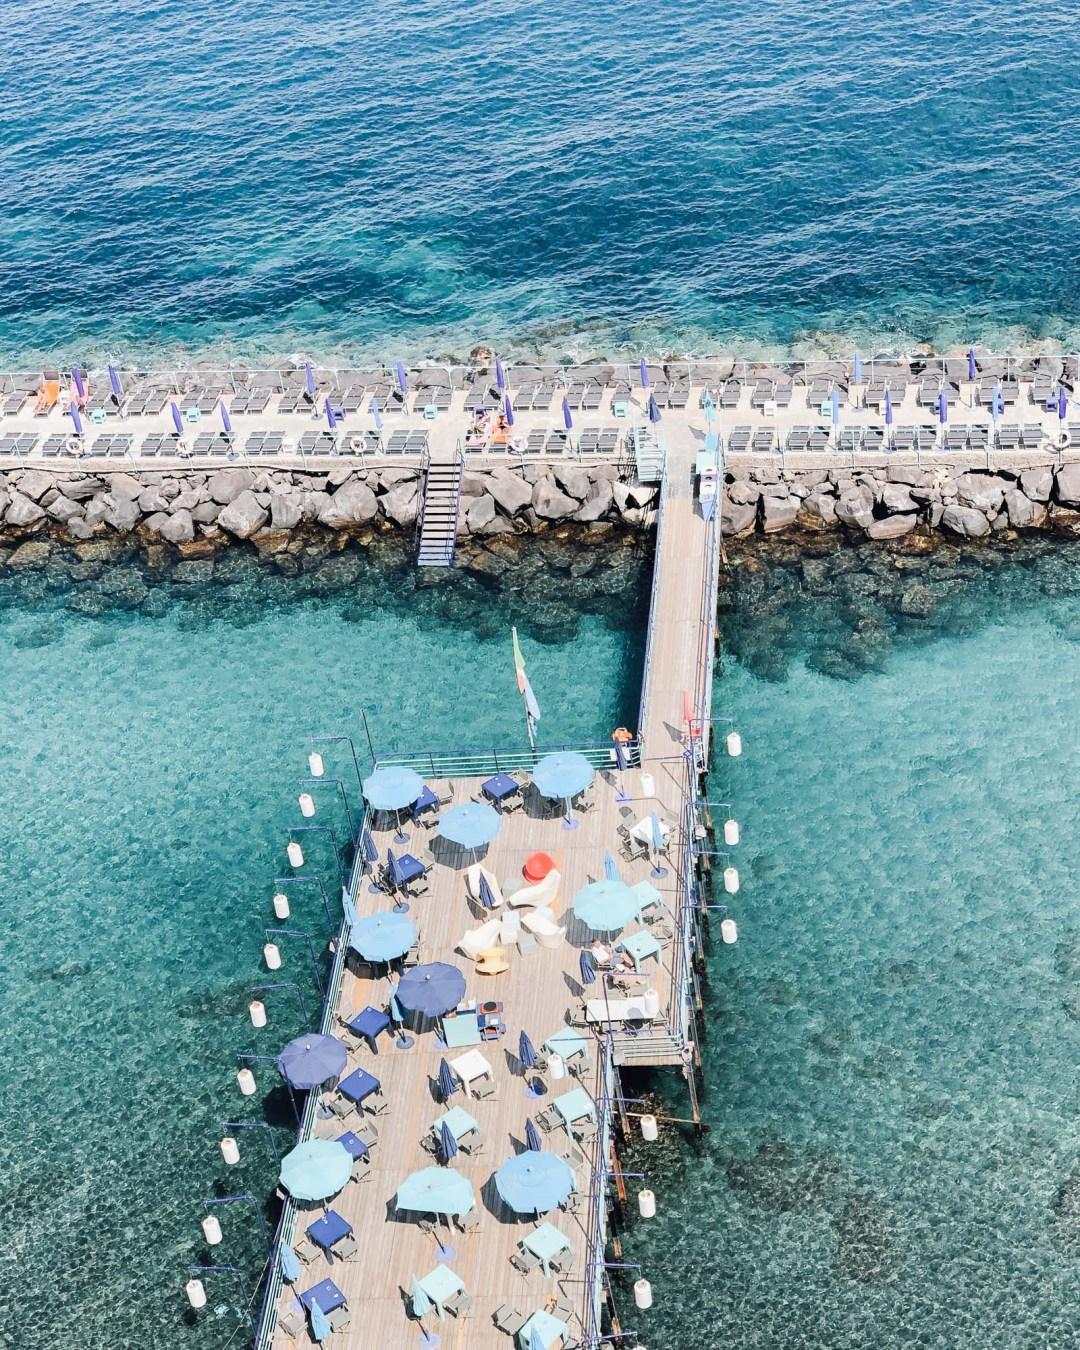 inastil, amalfikueste, urlaub, italien, sorrent, amalfi, positano, capri, luxusurlaub, cabrio, roadtrip, over50blogger, sommermode, ue50style, reiseblogger, reisebericht, traveldiary, reisetipps-53